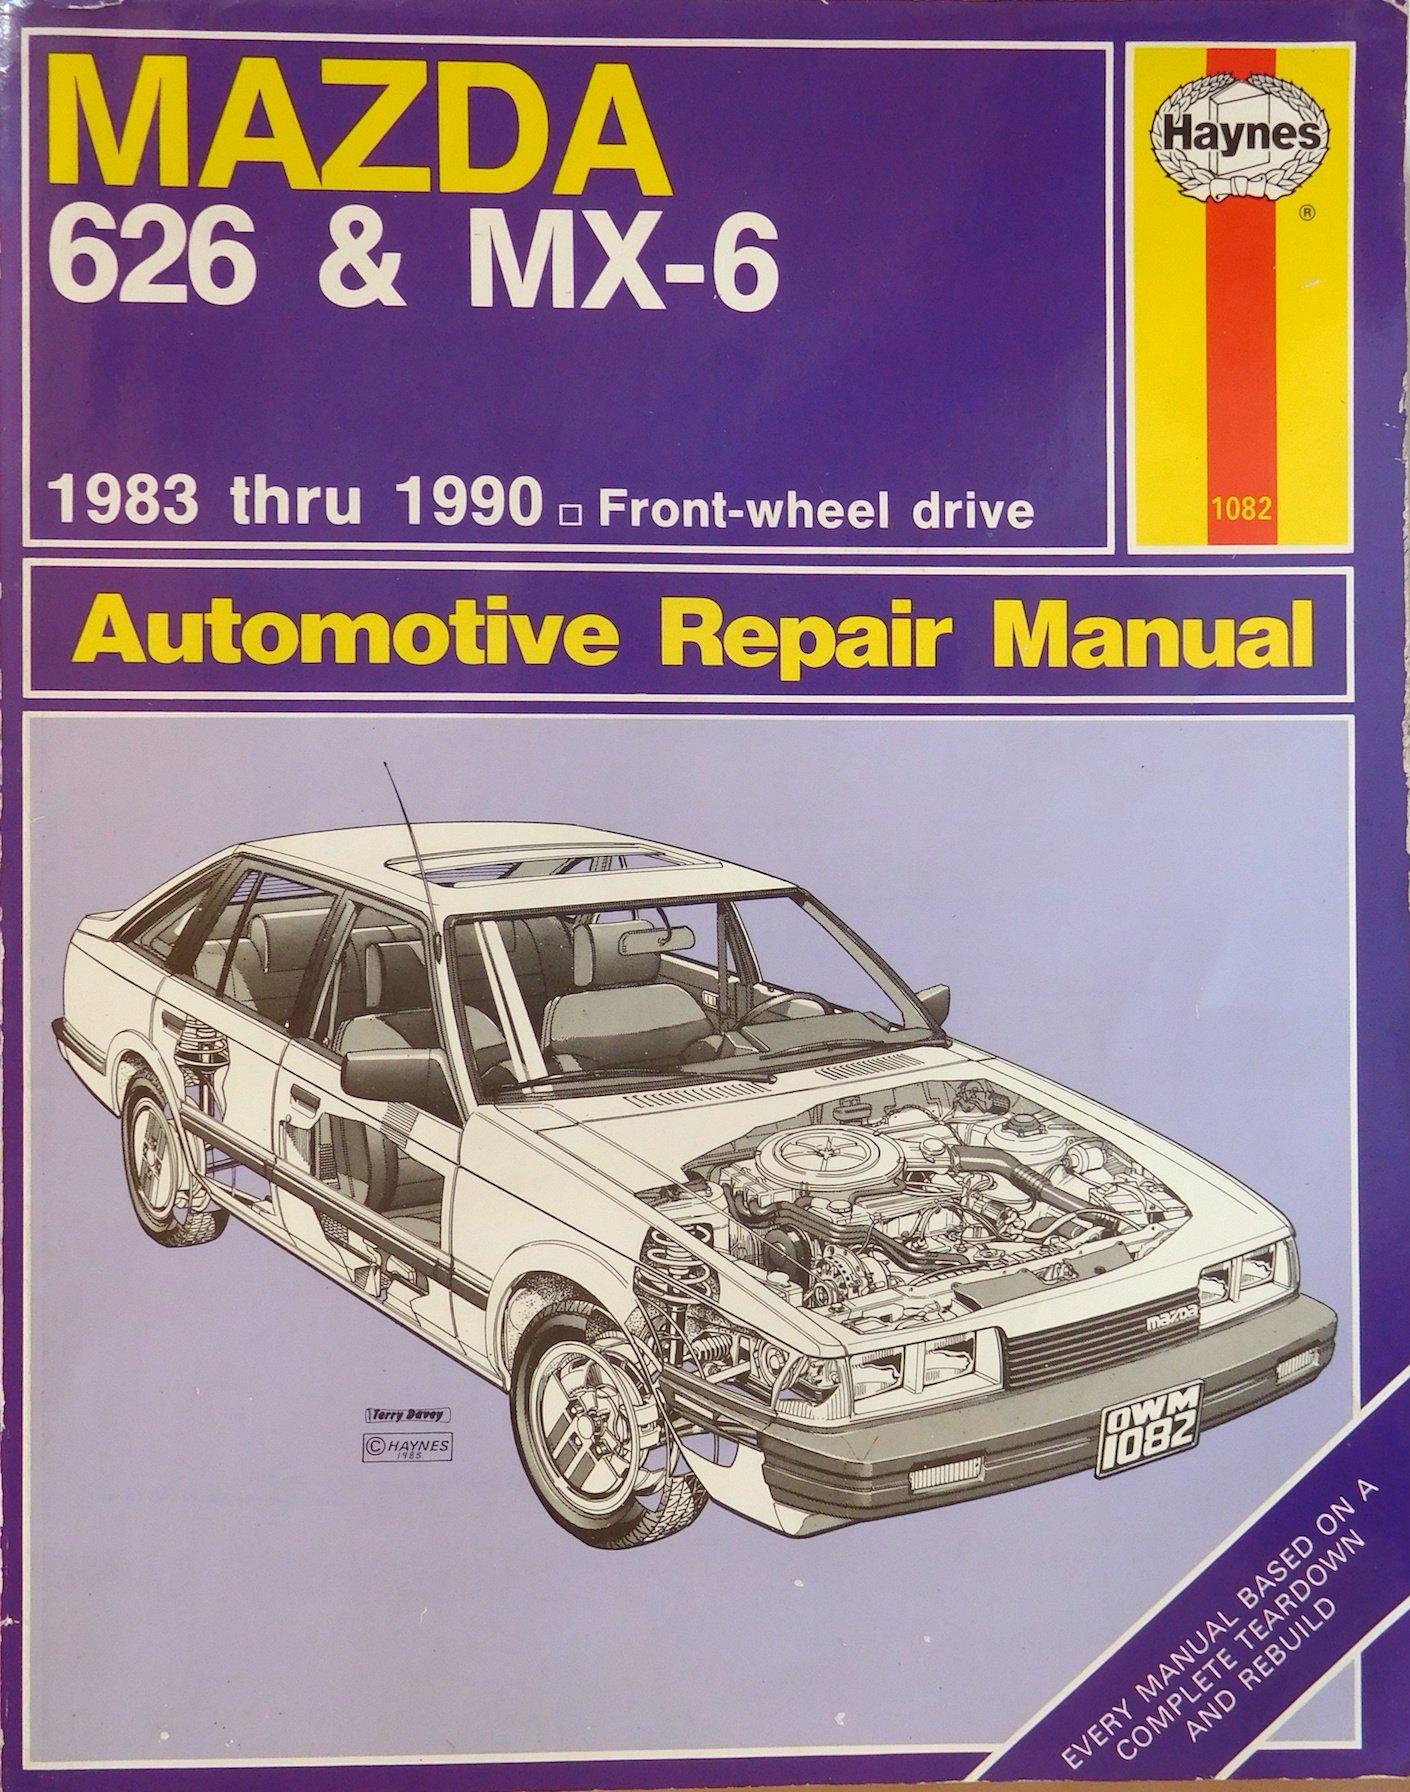 Mazda 626 & MX-6 Automotive Repair Manual: Larry Warren, John H Haynes:  9781850106401: Amazon.com: Books